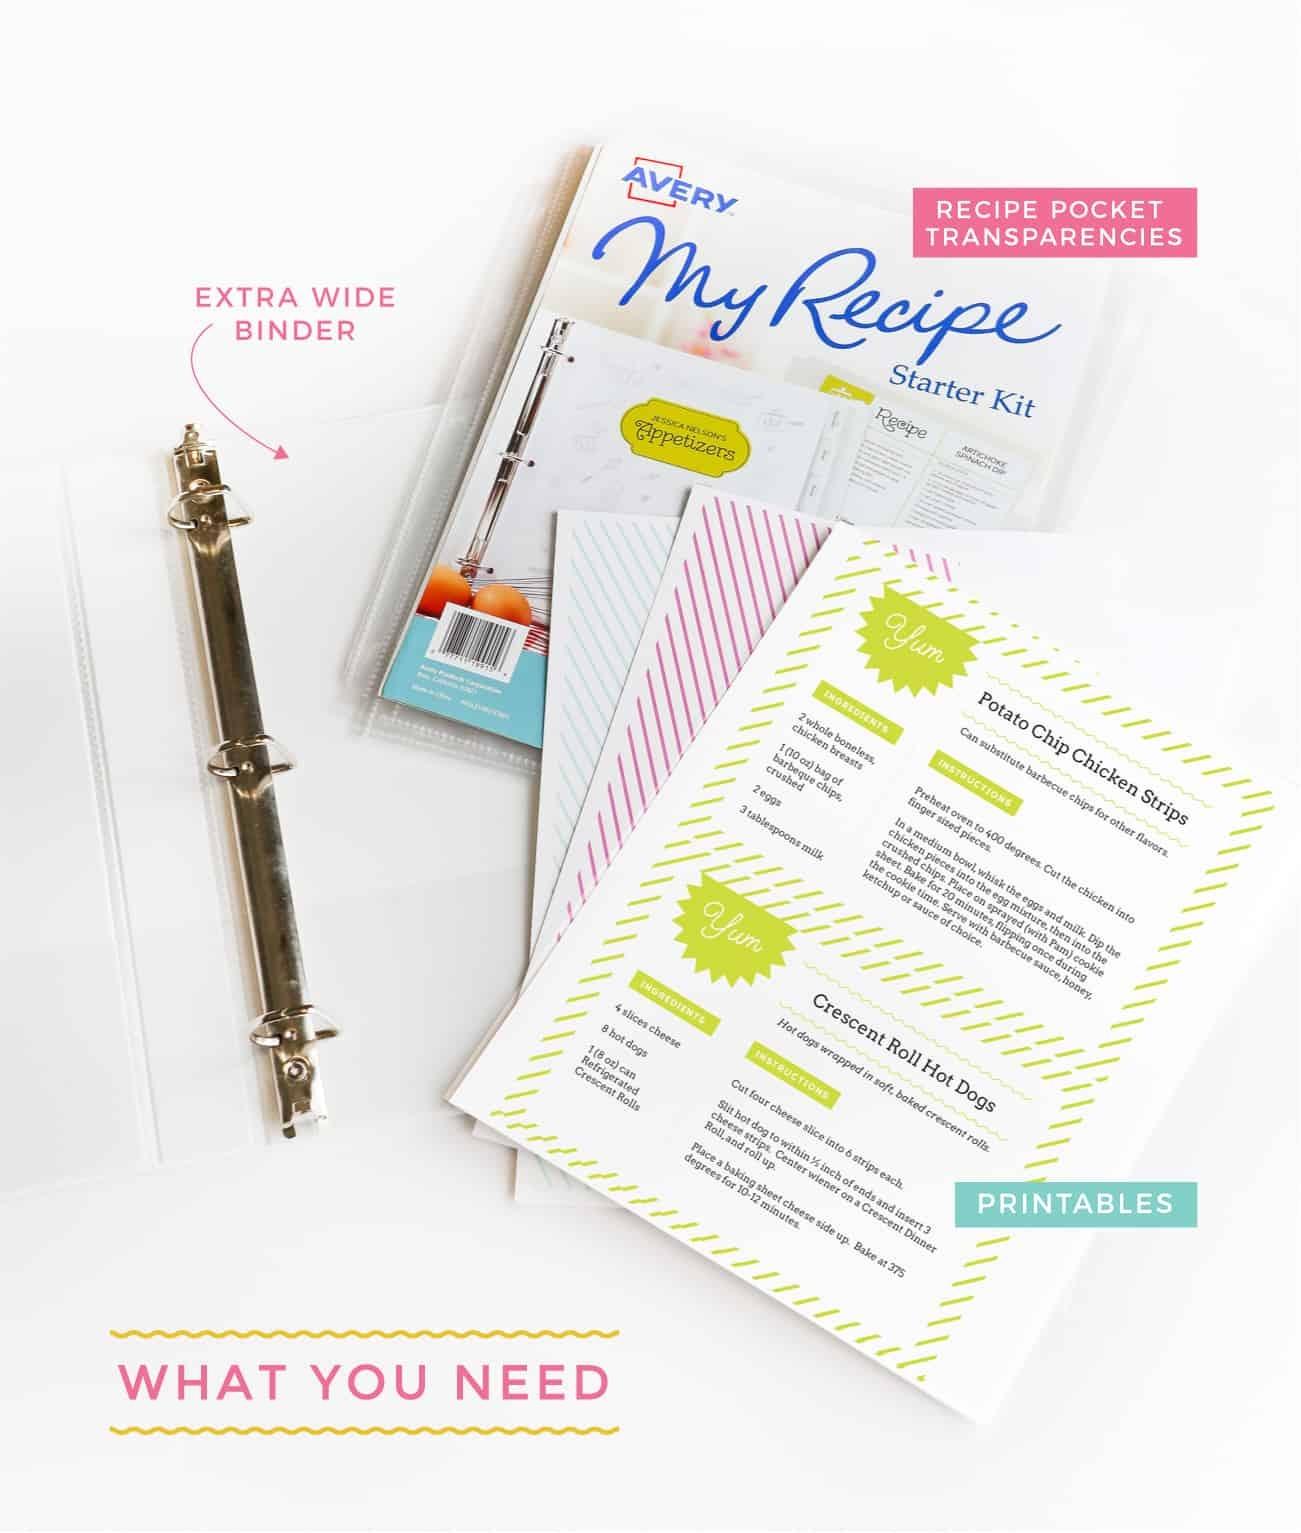 Diy Recipe Book (With Free Printable Recipe Binder Kit!) - Free Printable Recipe Binder Templates